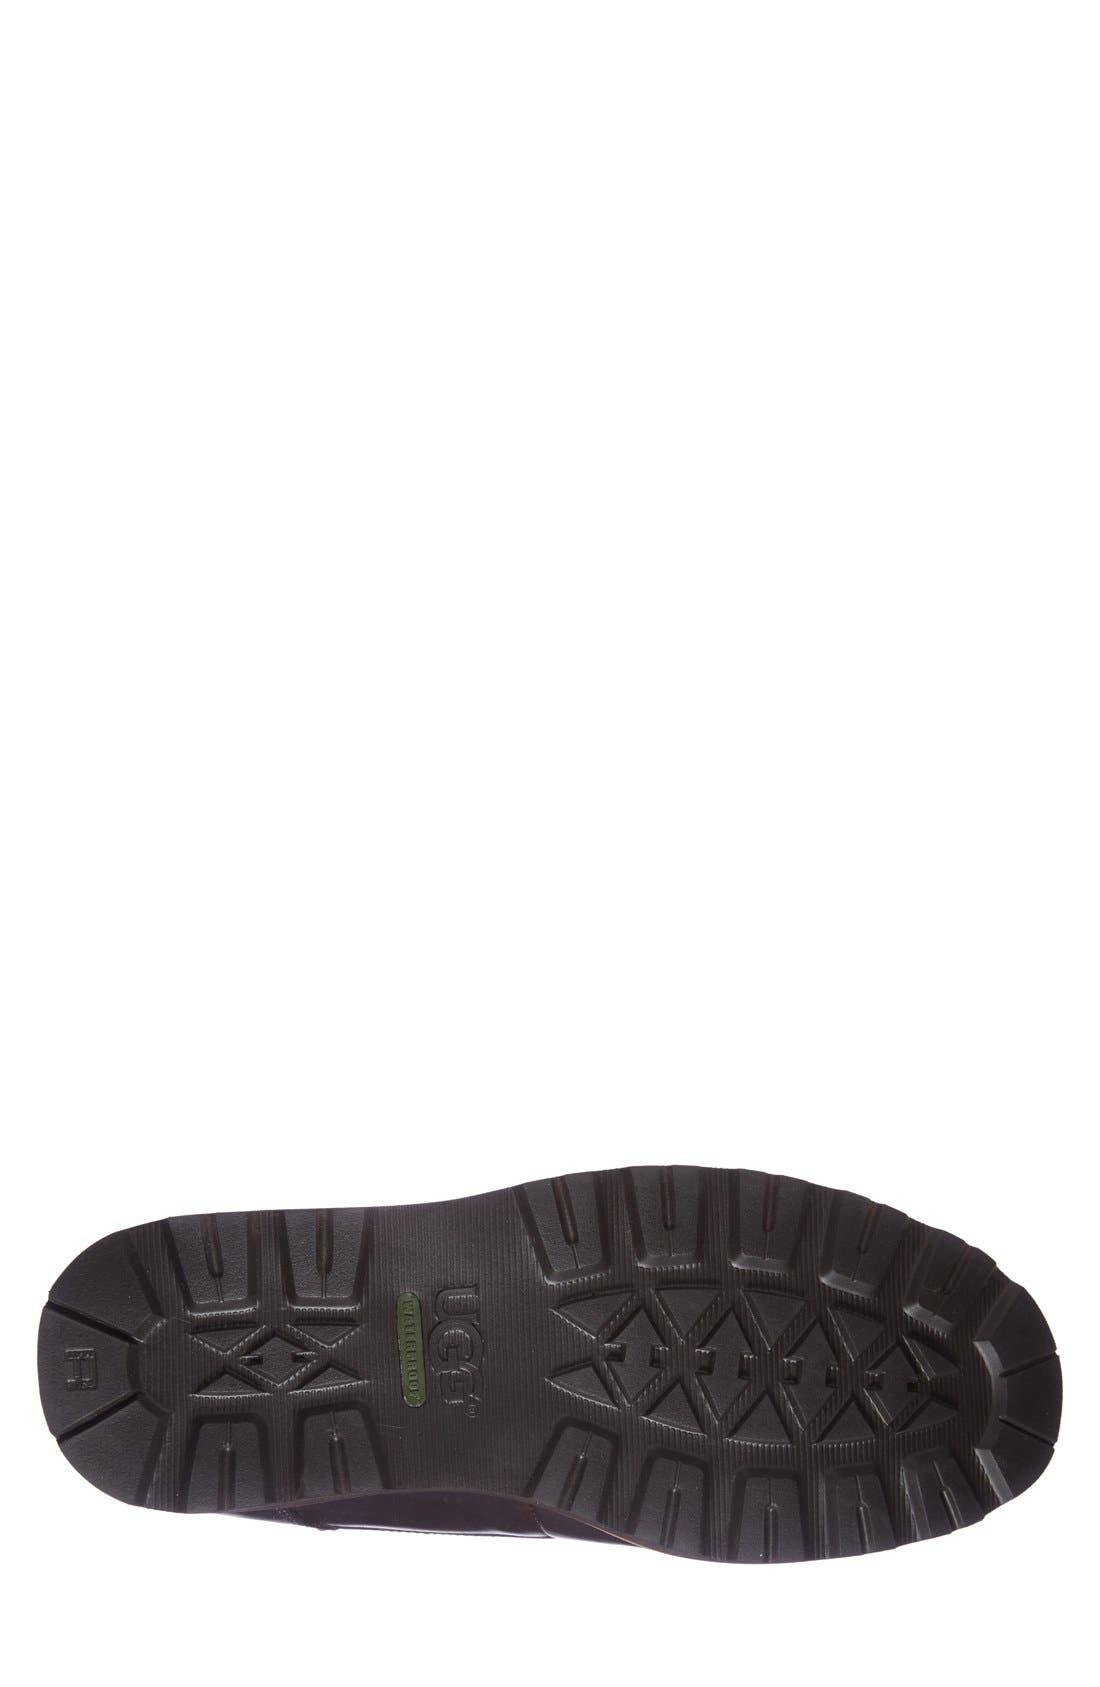 Alternate Image 4  - UGG®Seton Waterproof Chukka Boot (Men)